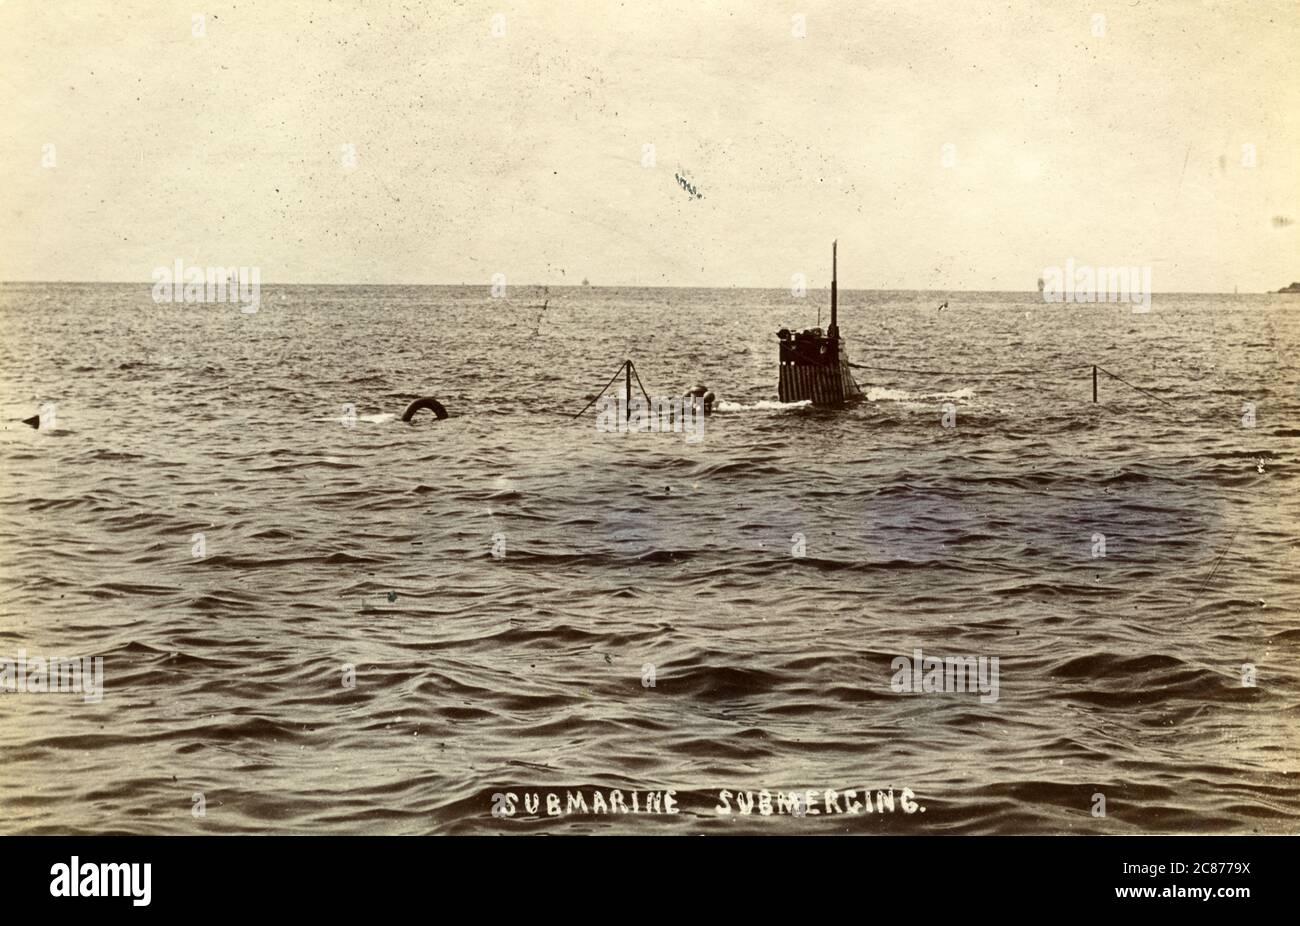 Probablement un sous-marin Holland Submerge, Angleterre. Banque D'Images